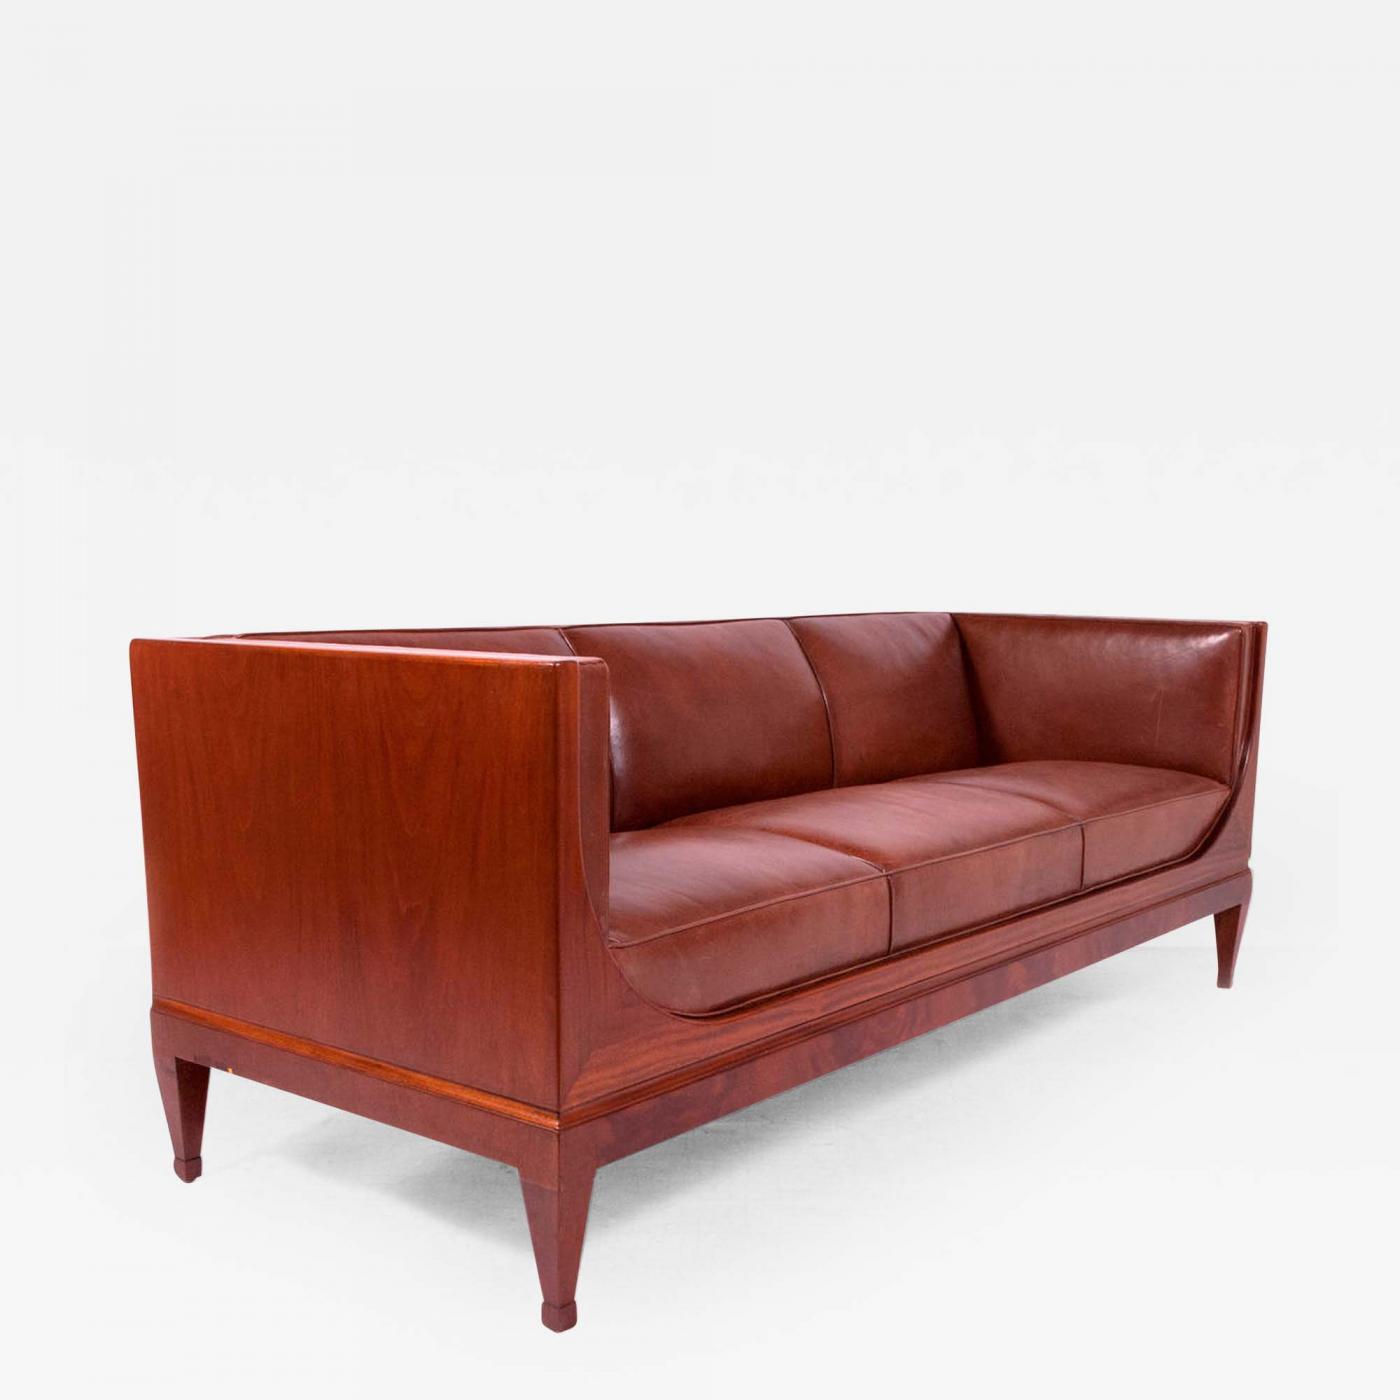 Frits Henningsen - Classic Sofa by Frits Henningsen, 1930s